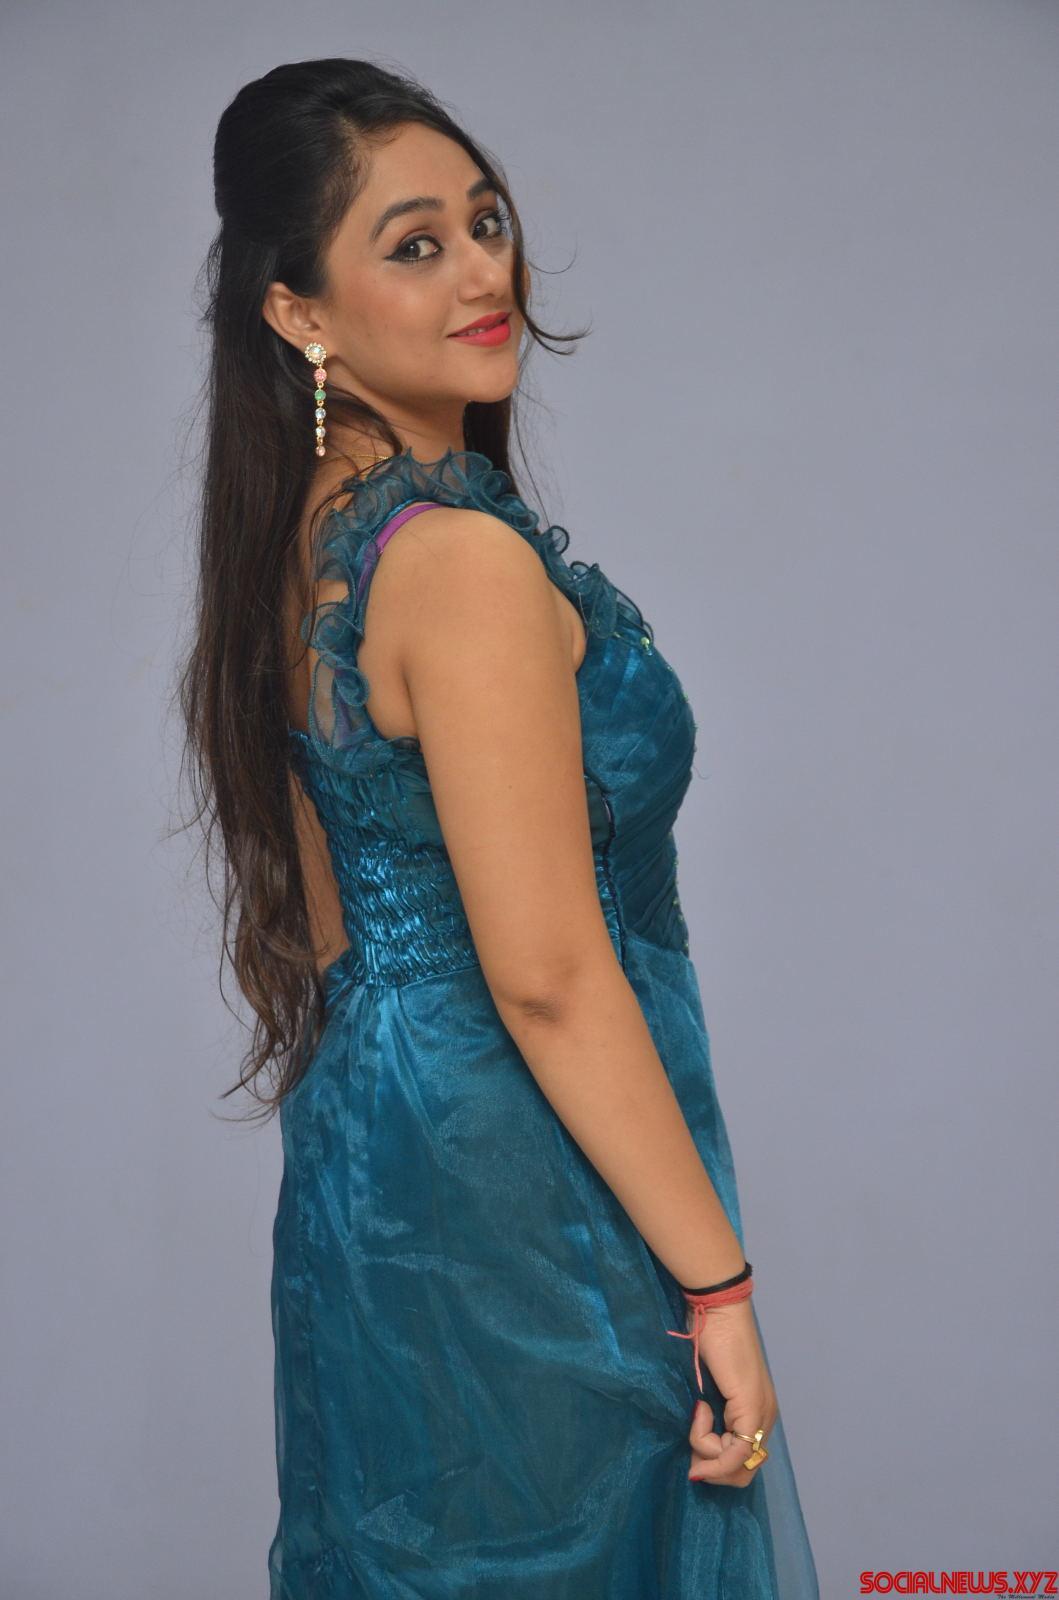 Actress Nitika Sharma Stills From Brahmand Nayak Sai Baba